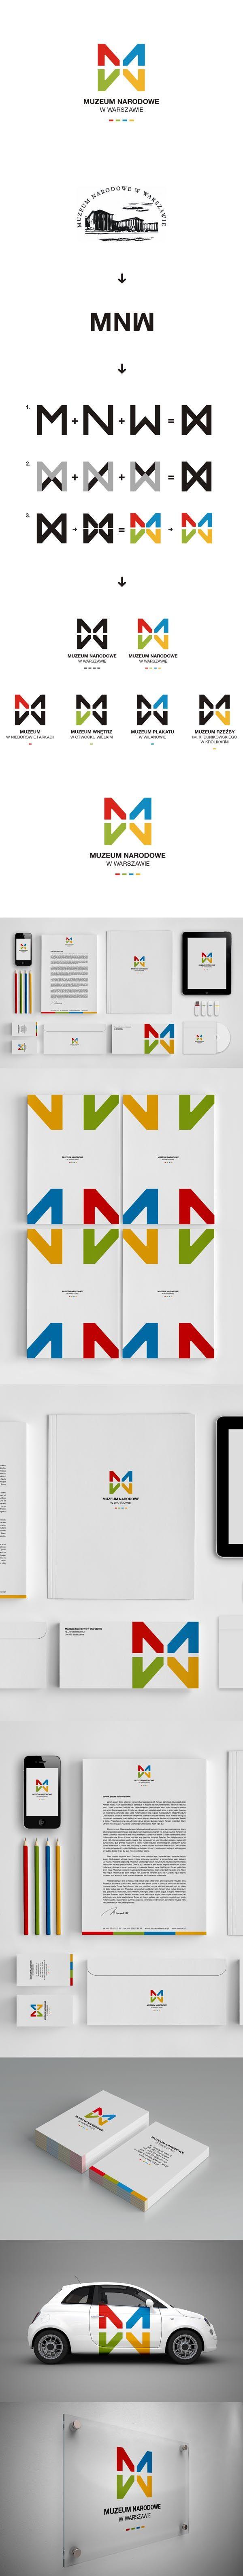 Muzeum Nadorowe branding #design #corporate #identity #branding #visual